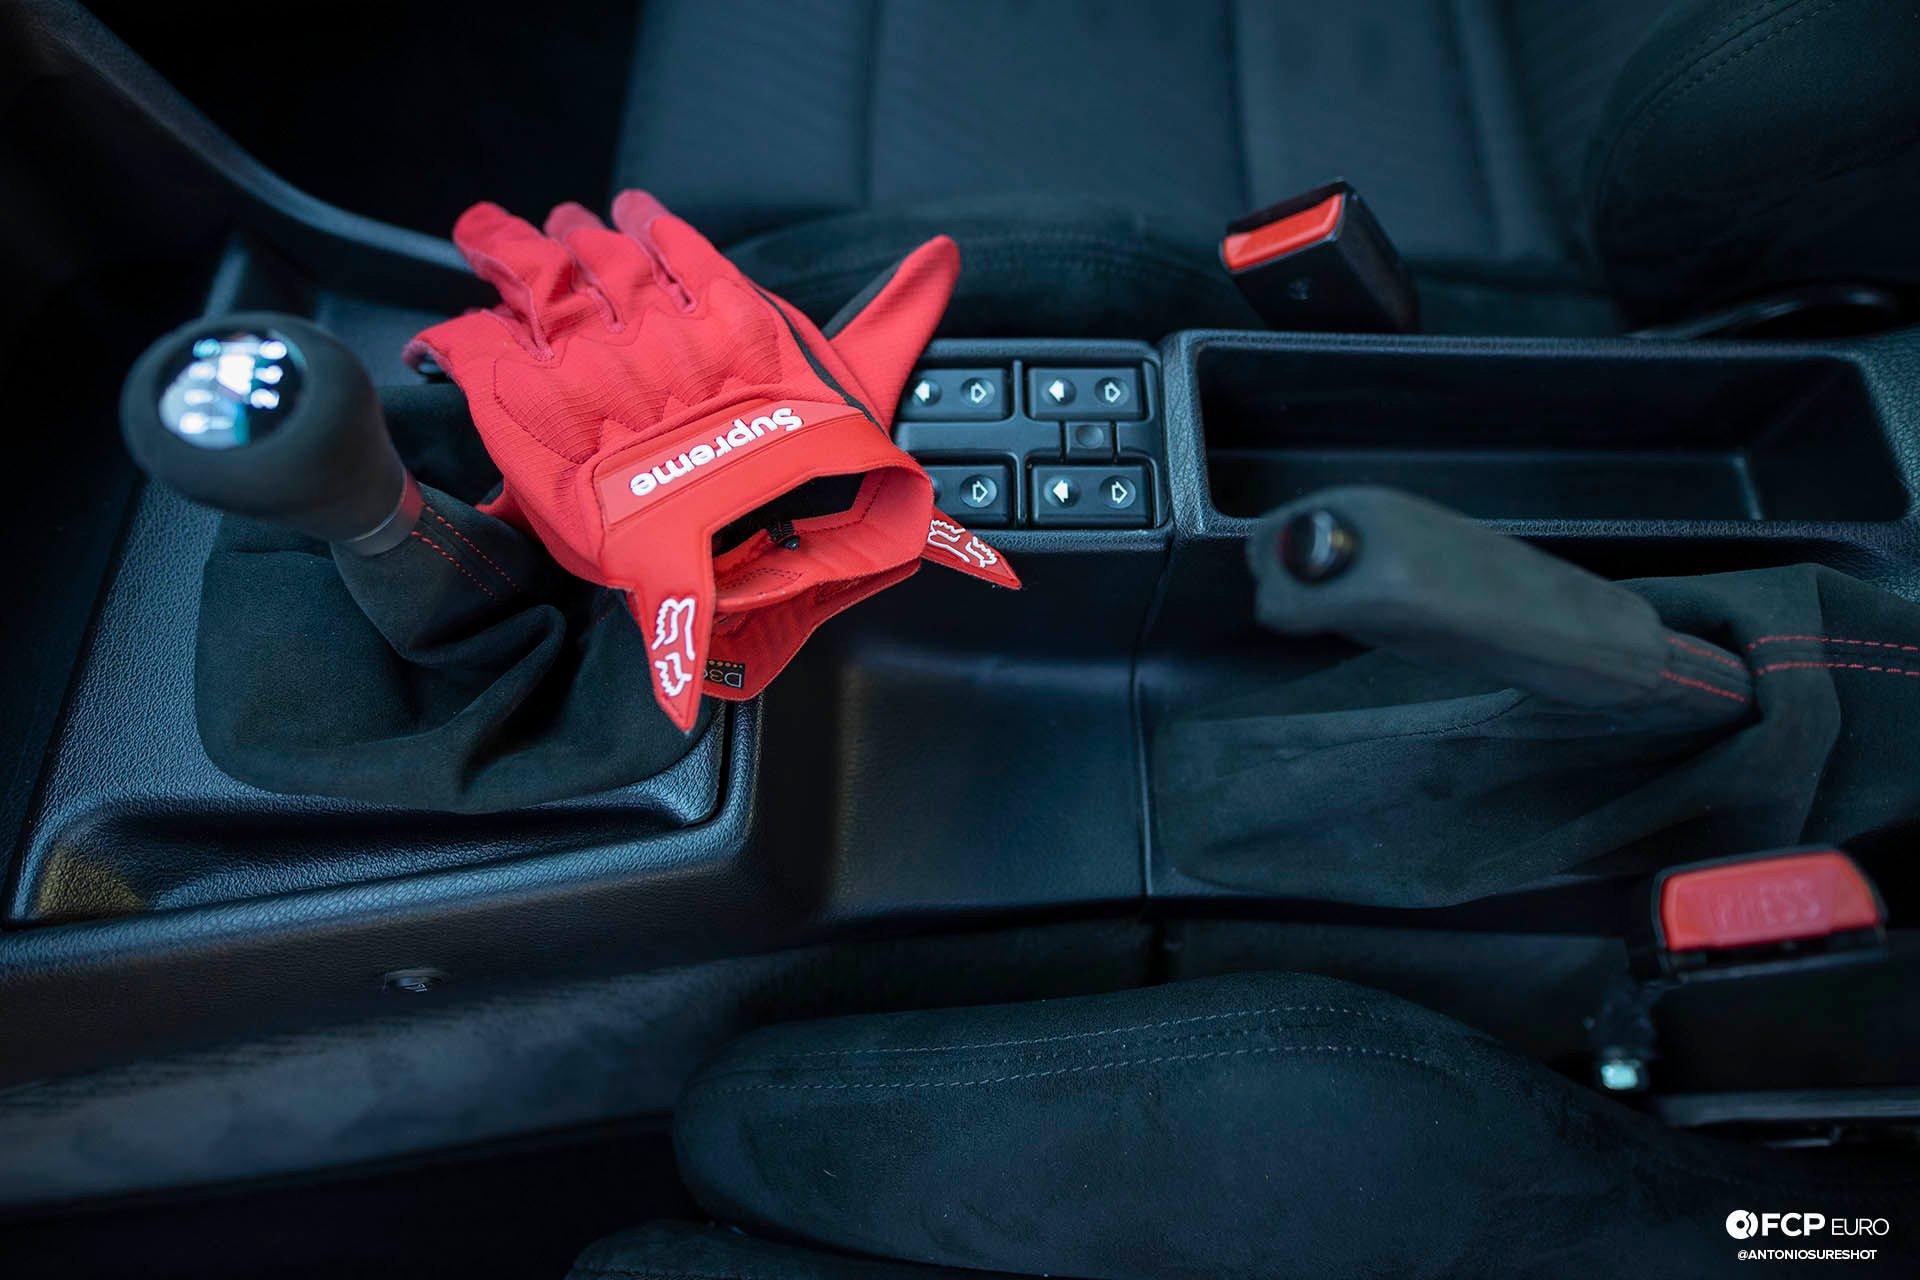 E34 BMW 540i M-Sport Supreme x Fox Racing gloves